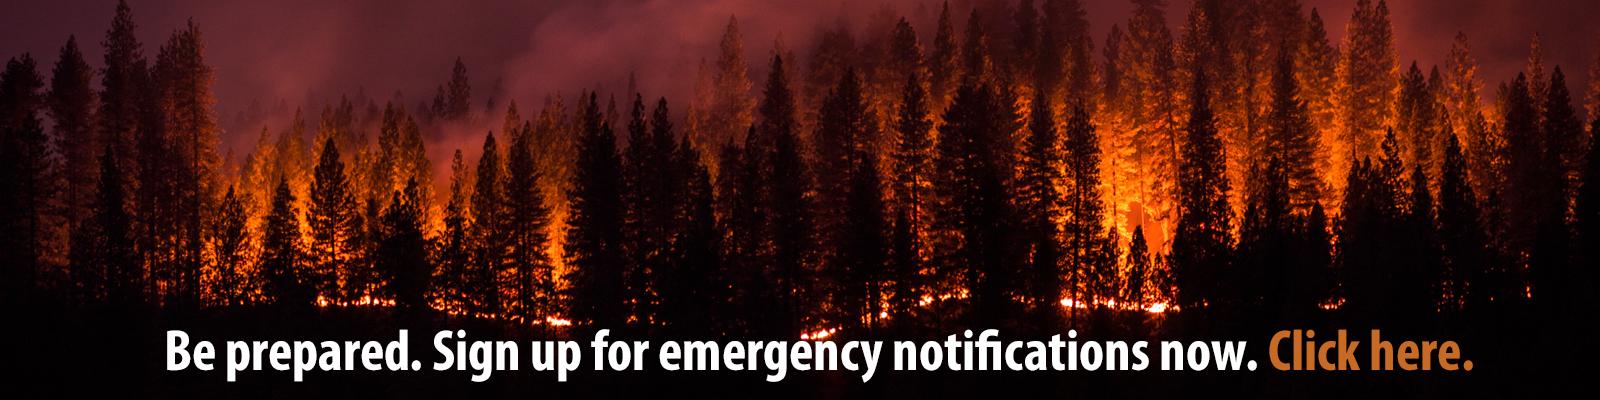 Sign up for emergency alerts